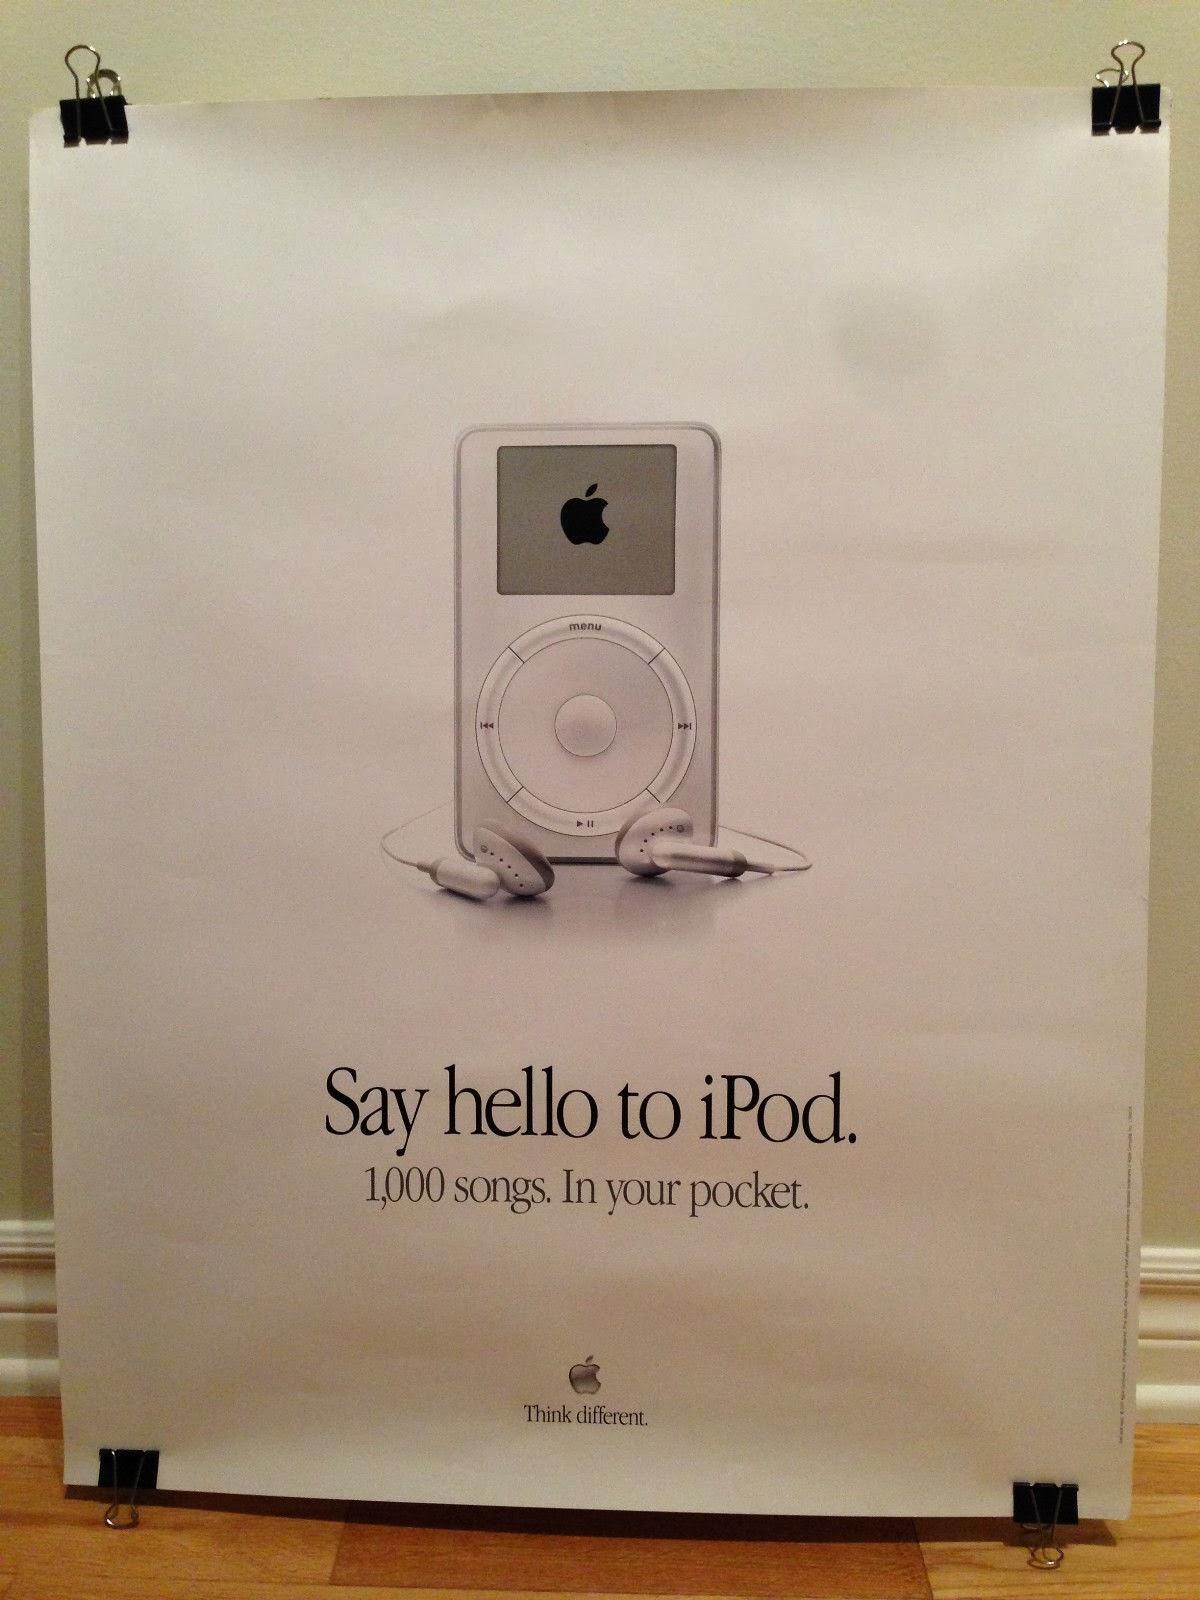 ipod 最初的宣传海报 来源:blogspot